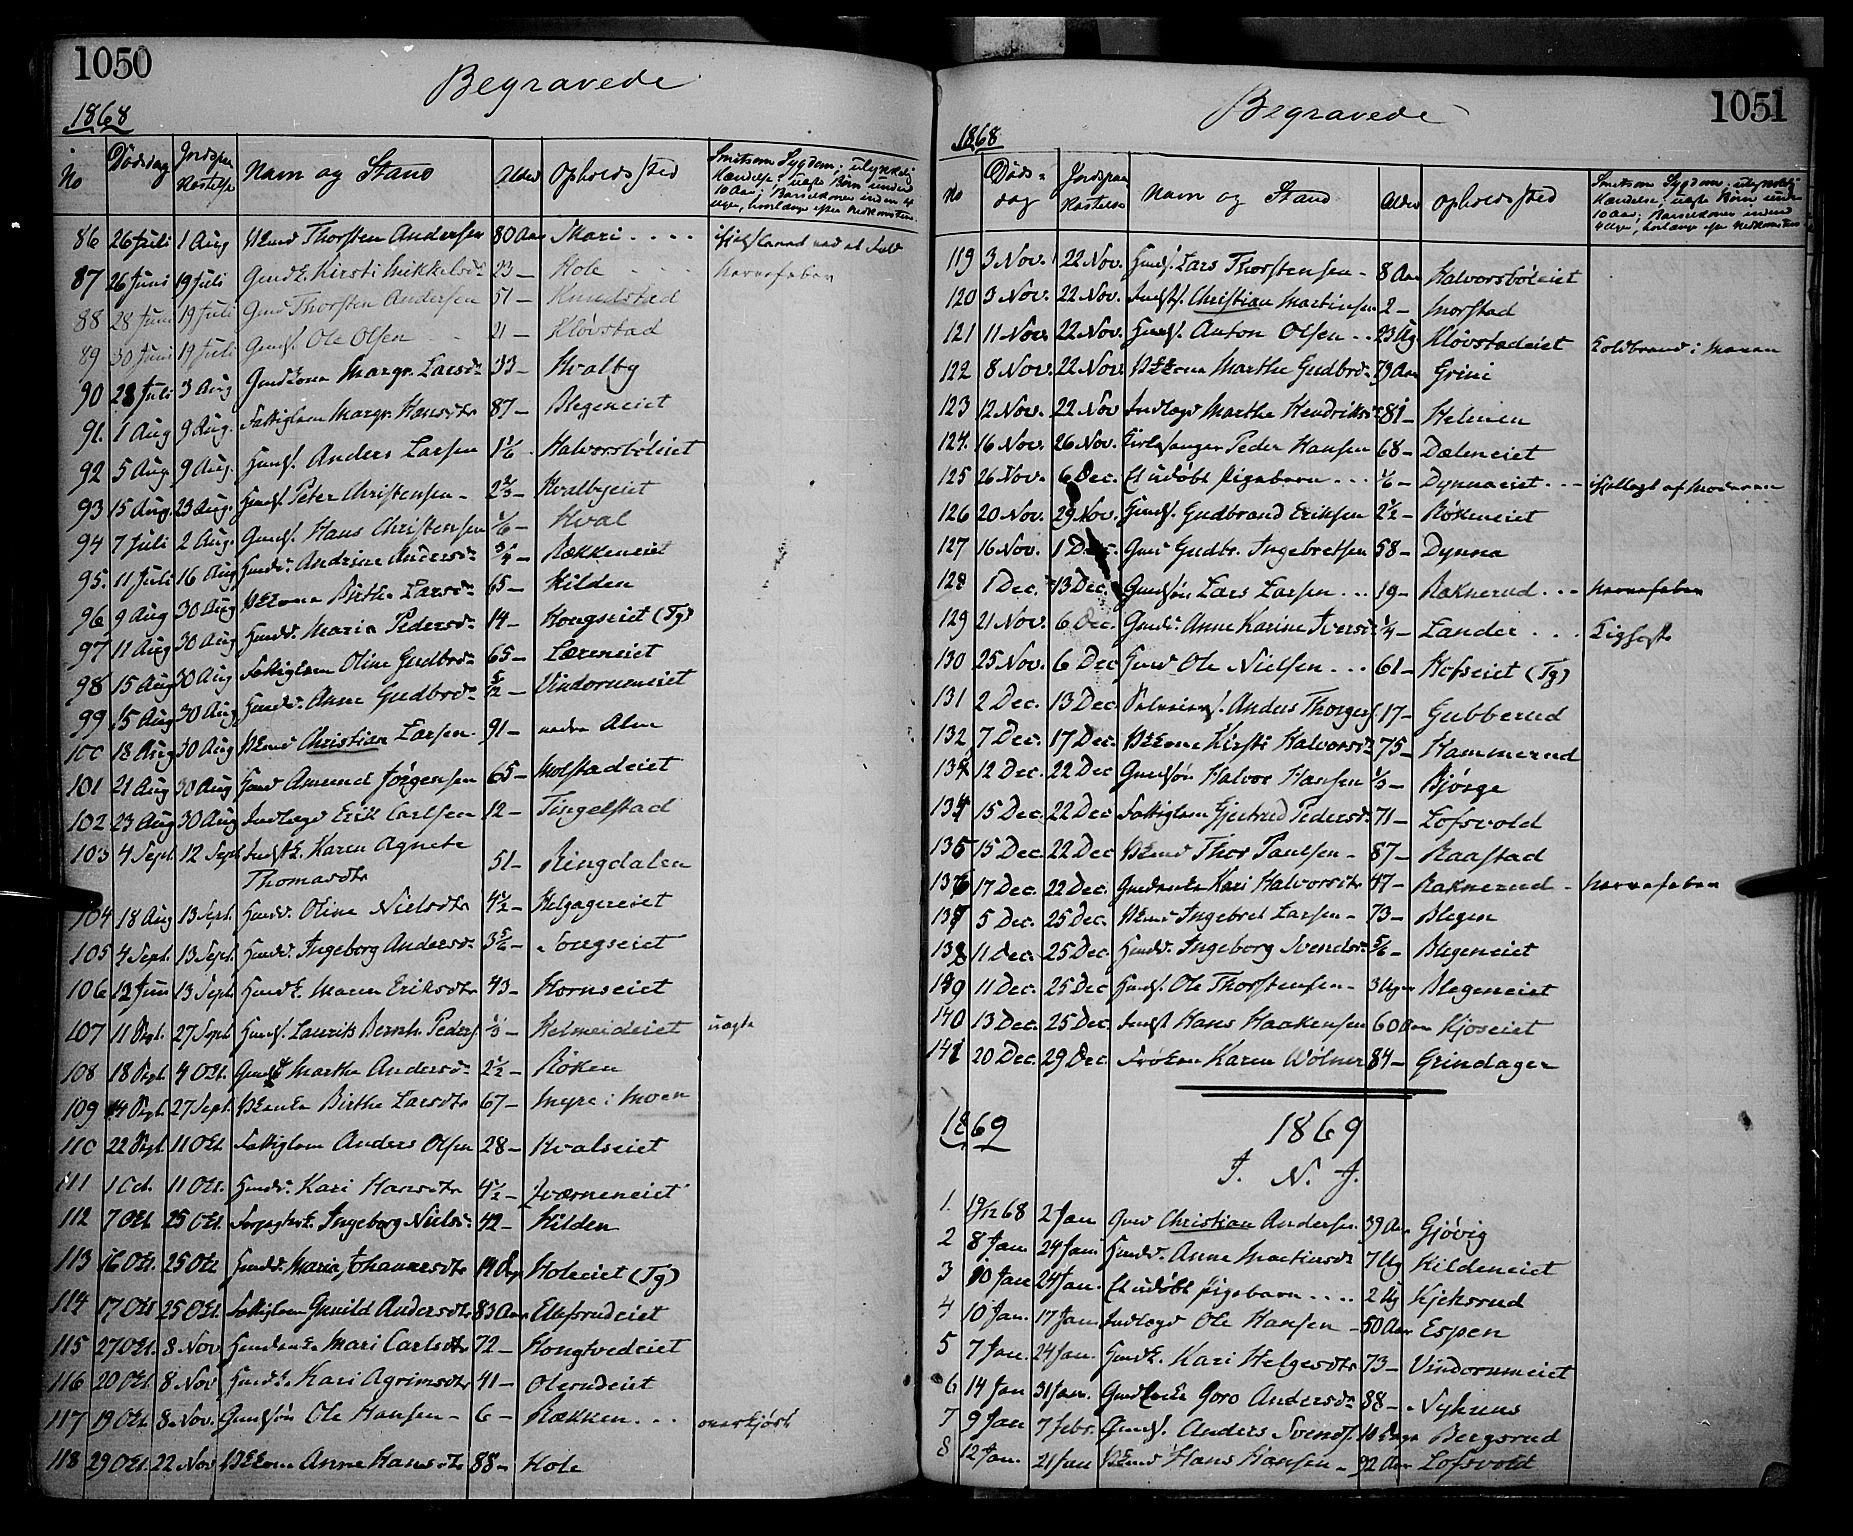 SAH, Gran prestekontor, Ministerialbok nr. 12, 1856-1874, s. 1050-1051